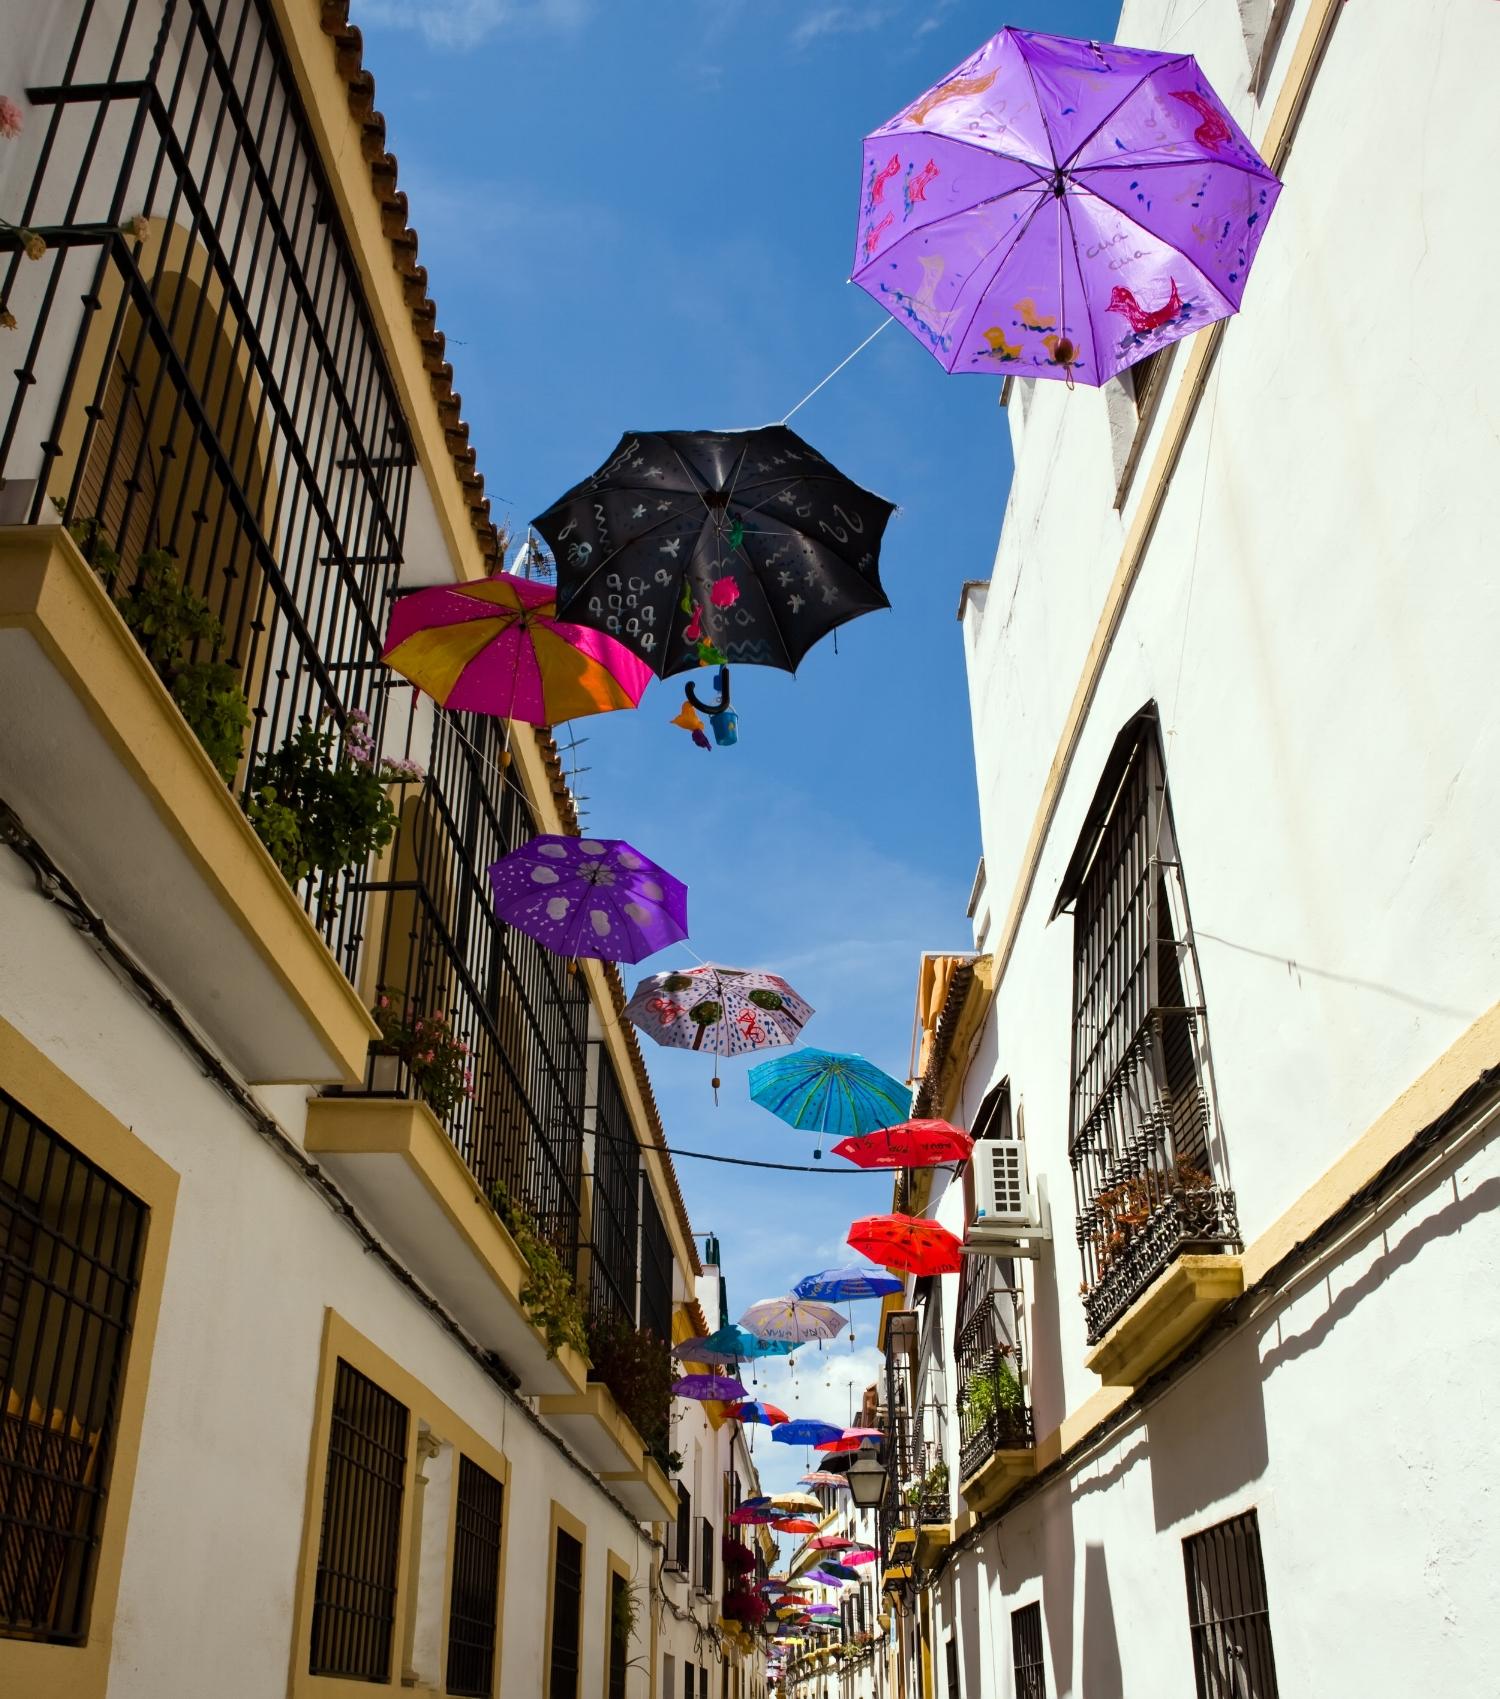 Streets of the Judería during festivals